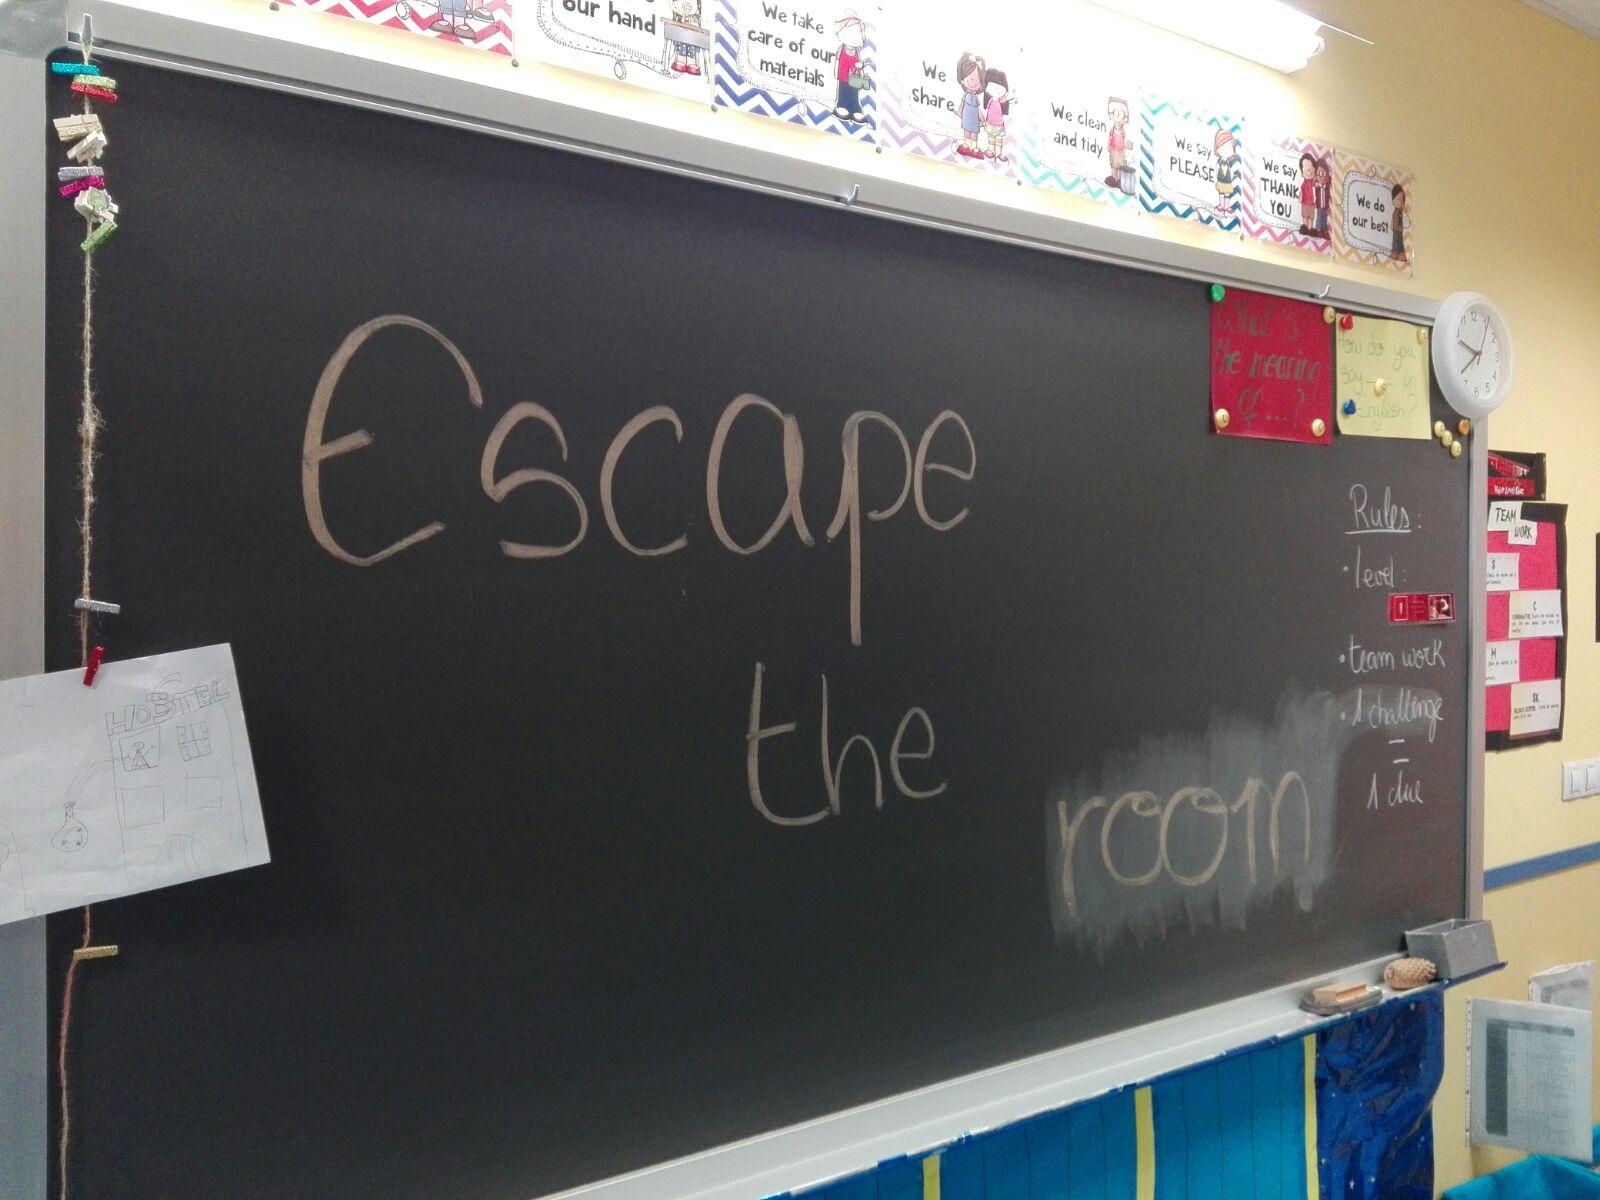 Scape Room El Hacker Tripadvisor